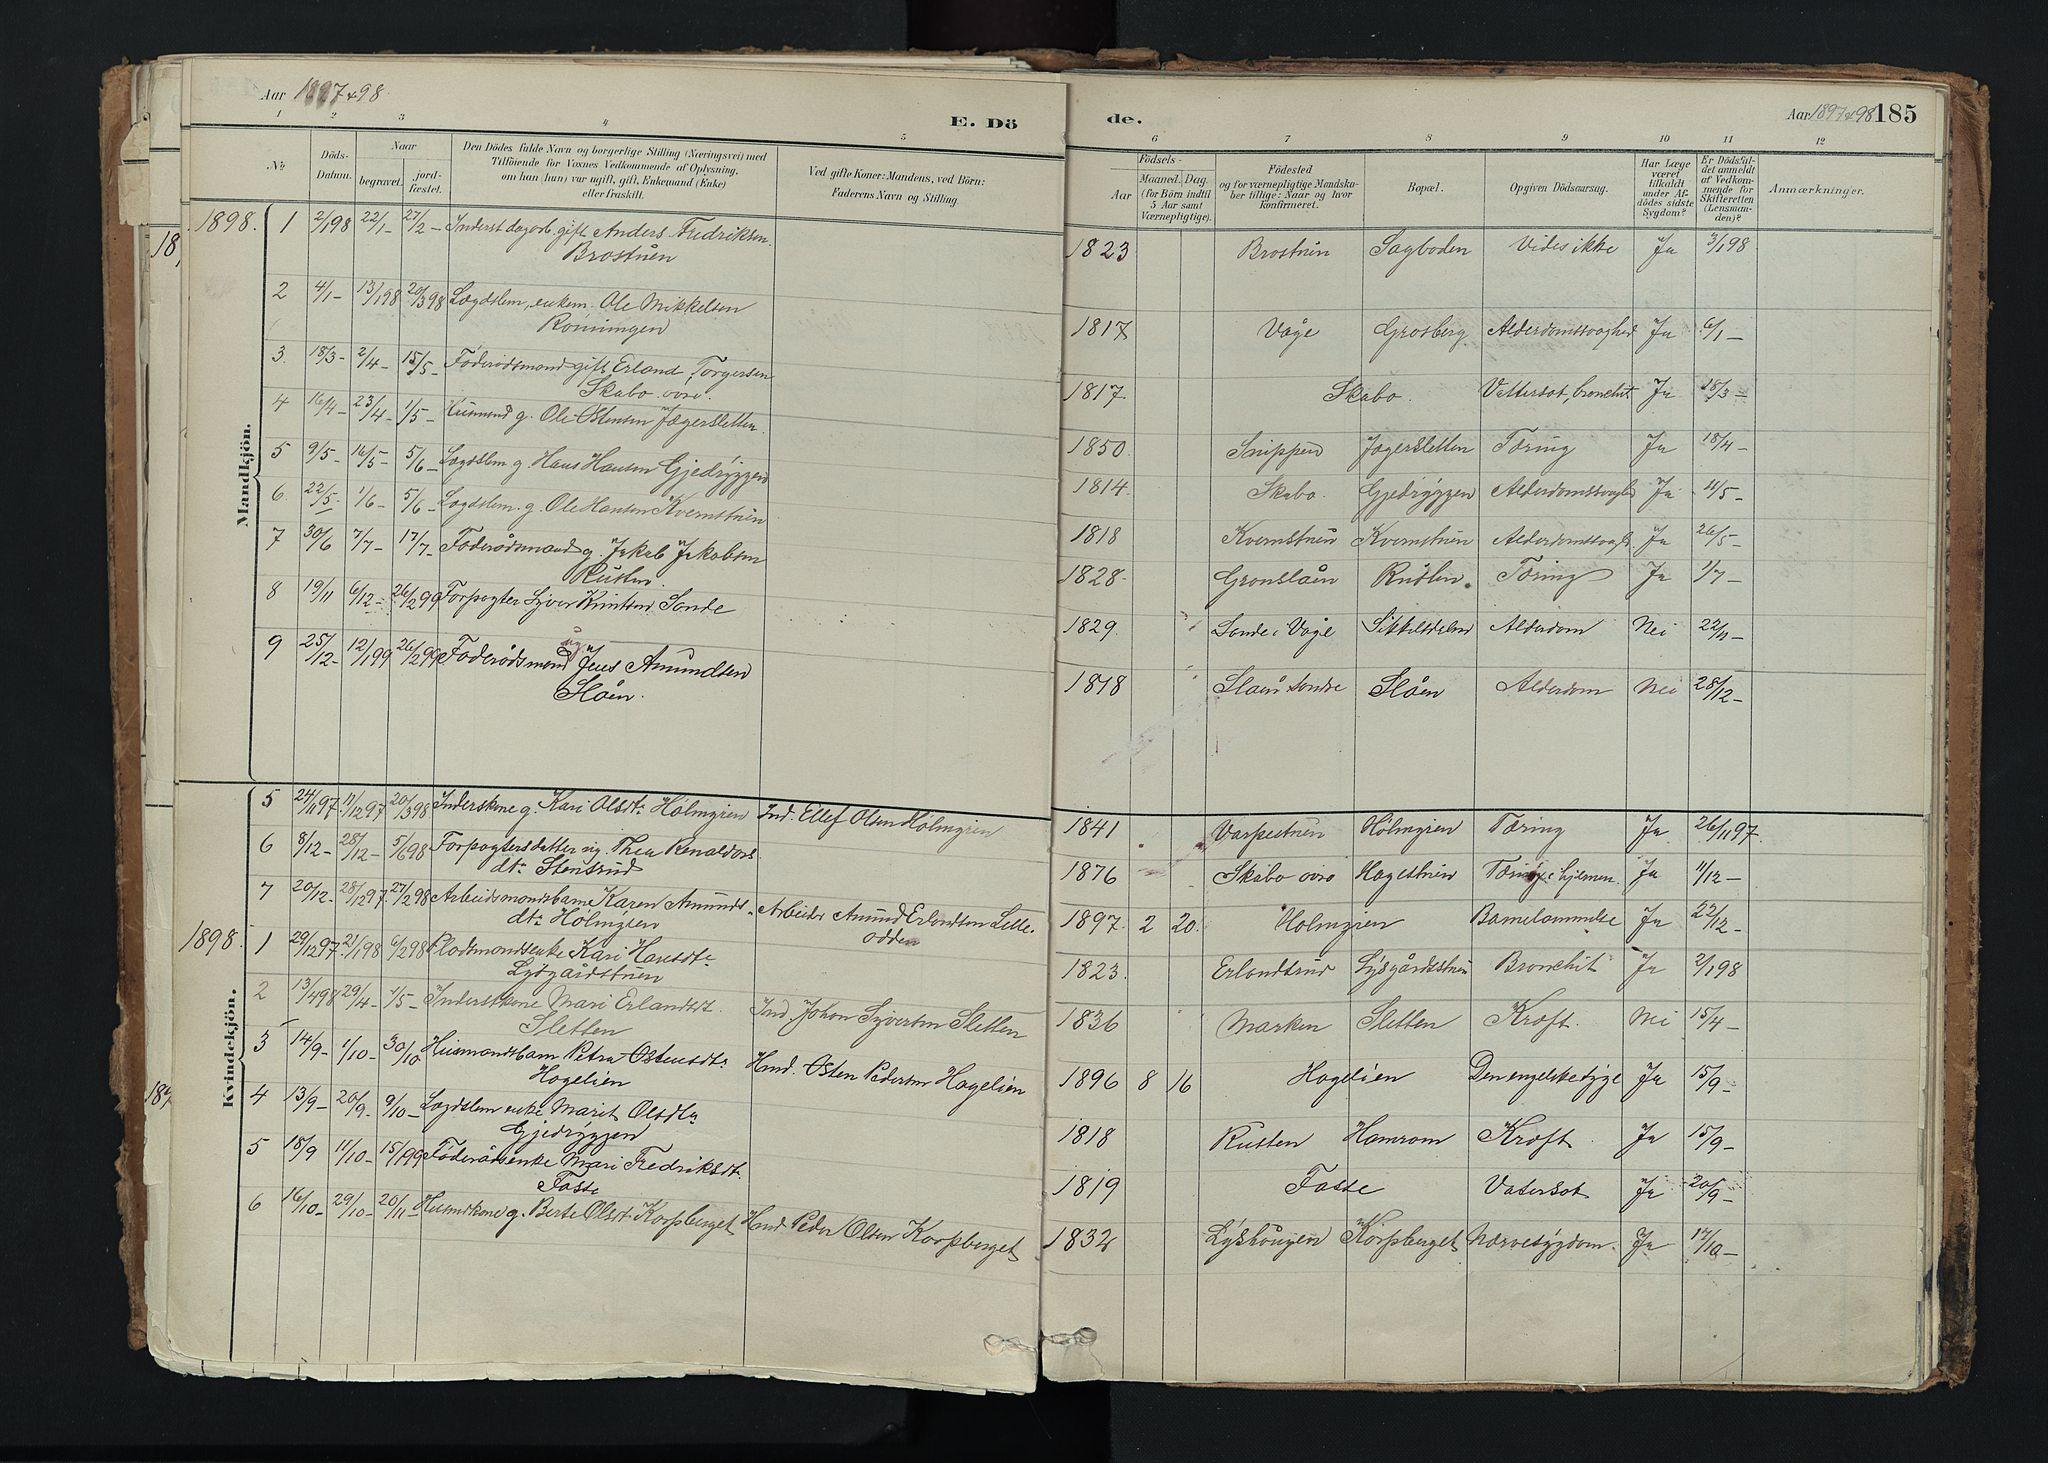 SAH, Nord-Fron prestekontor, Ministerialbok nr. 5, 1884-1914, s. 185